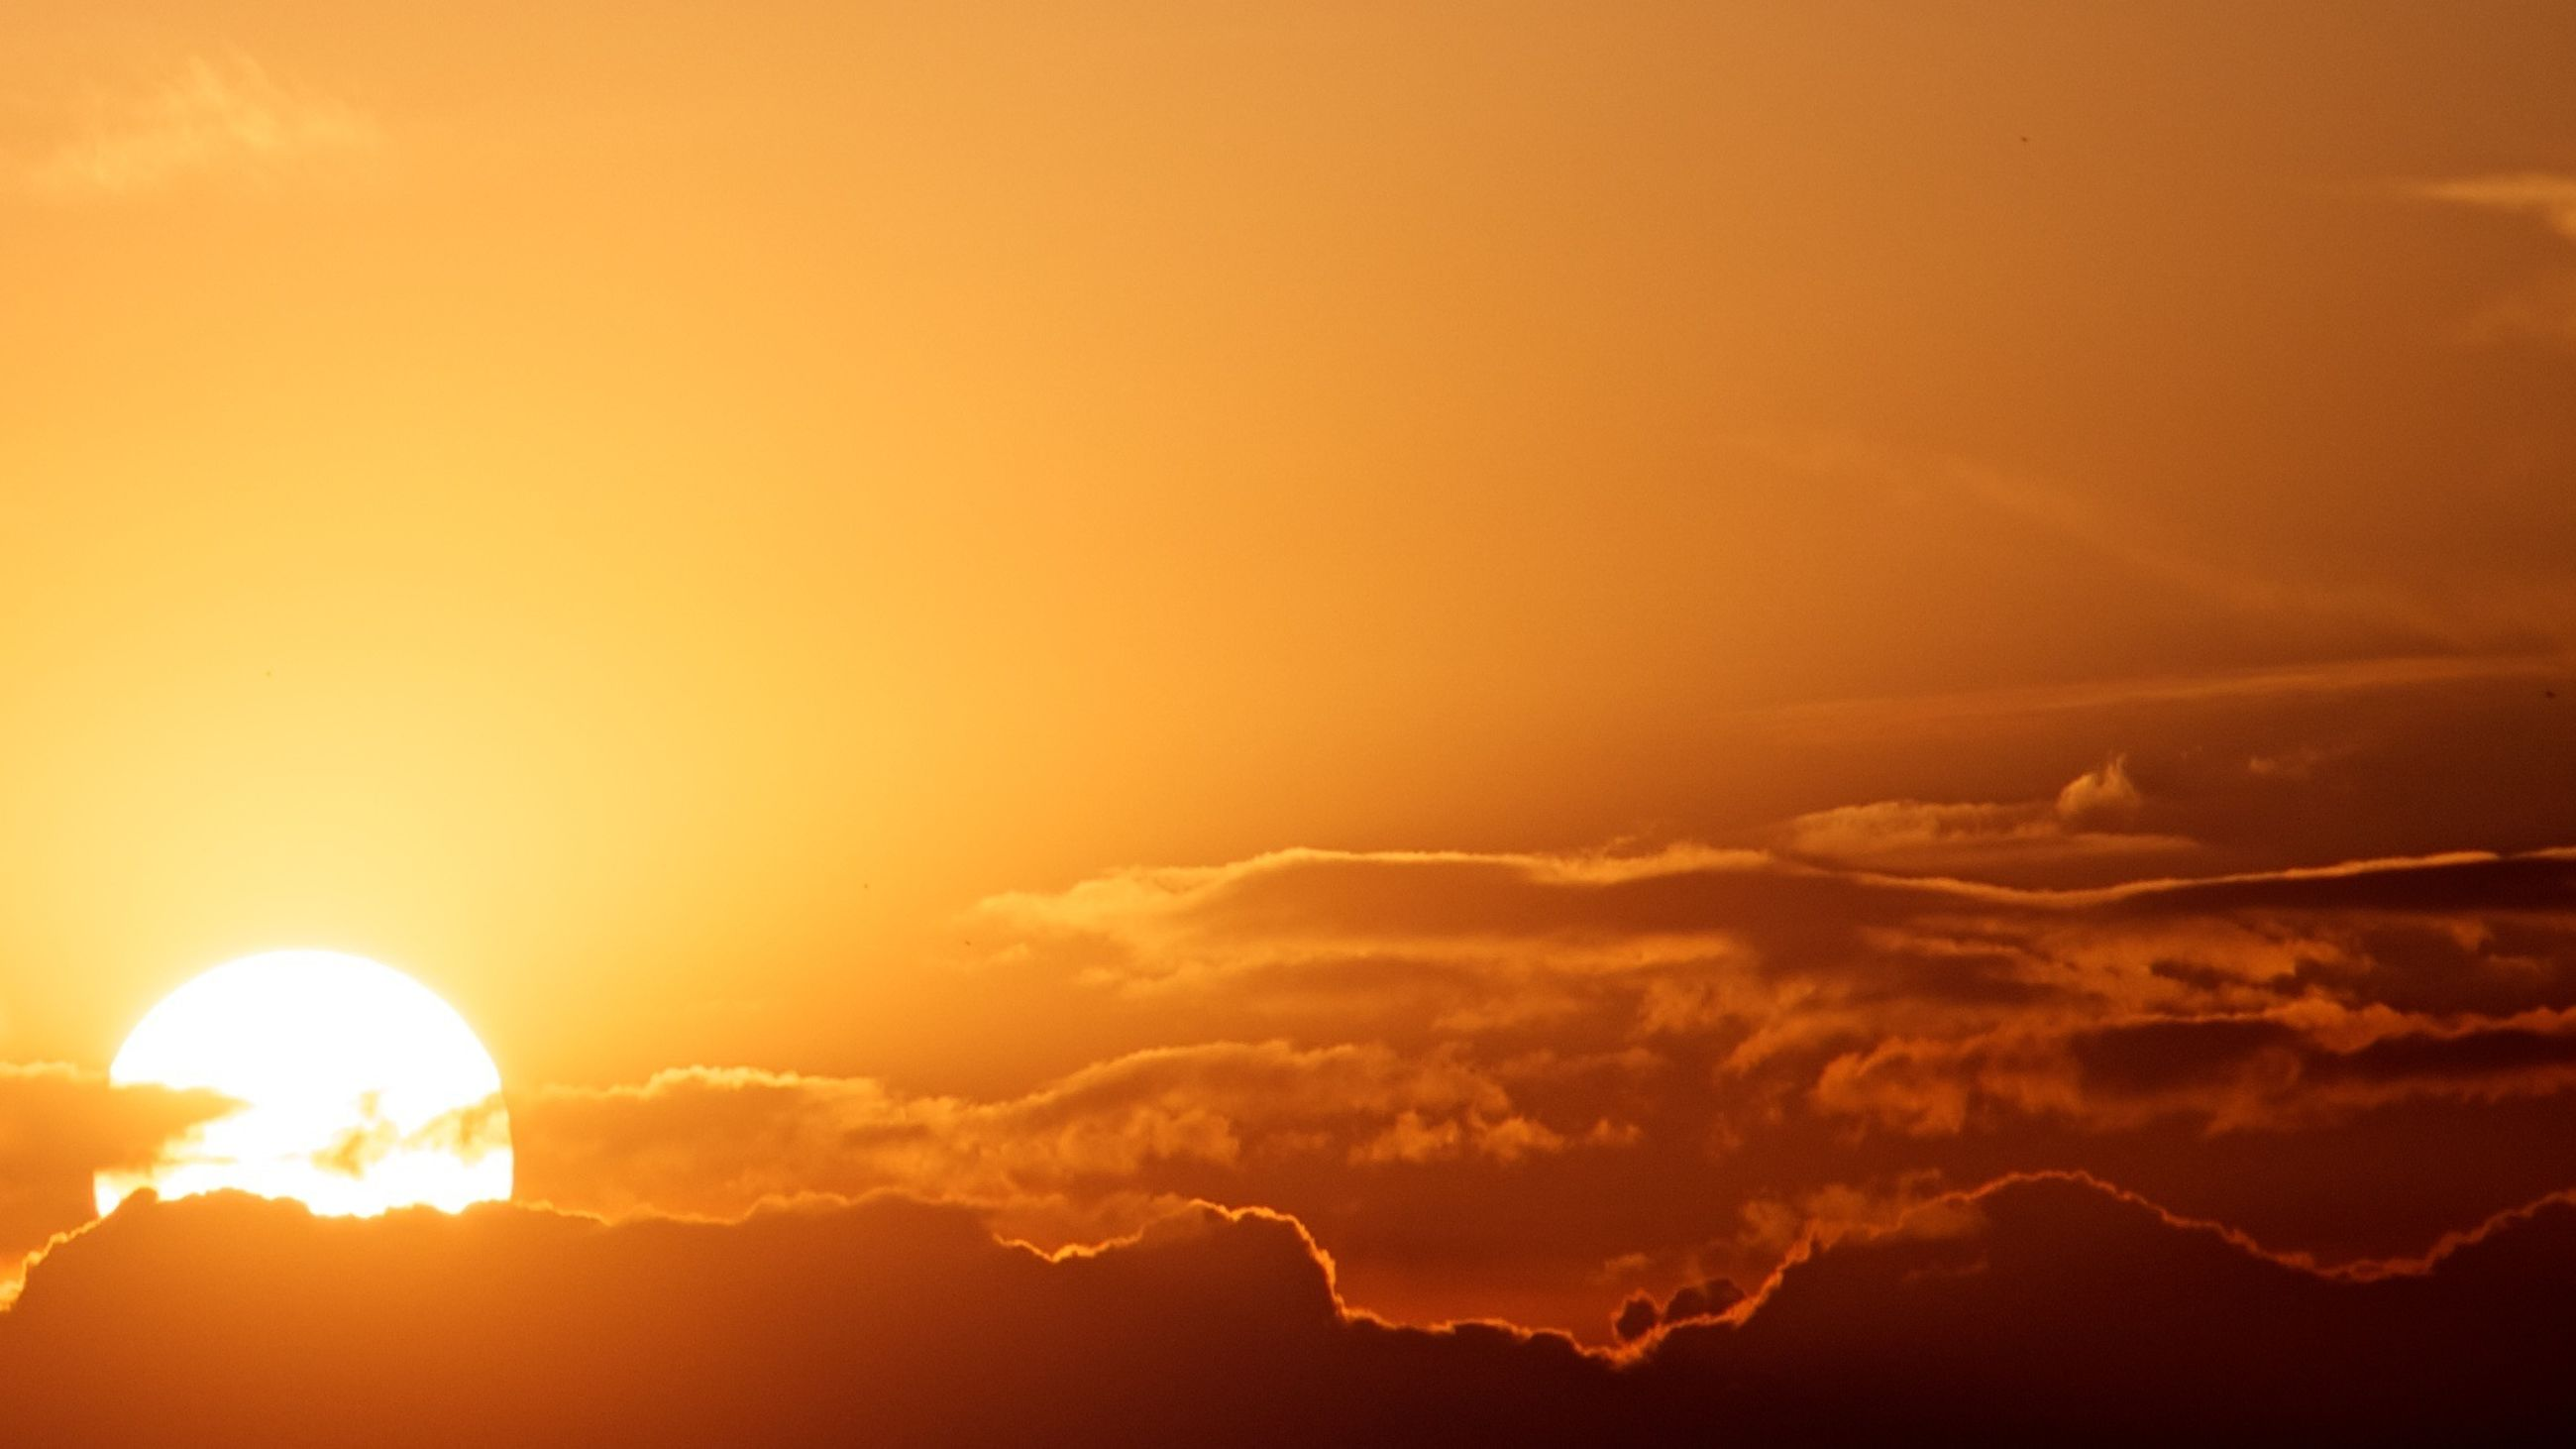 sunset, orange color, sun, scenics, sky, beauty in nature, tranquil scene, tranquility, silhouette, idyllic, cloud - sky, nature, majestic, sunlight, cloud, sunbeam, dramatic sky, low angle view, cloudscape, outdoors